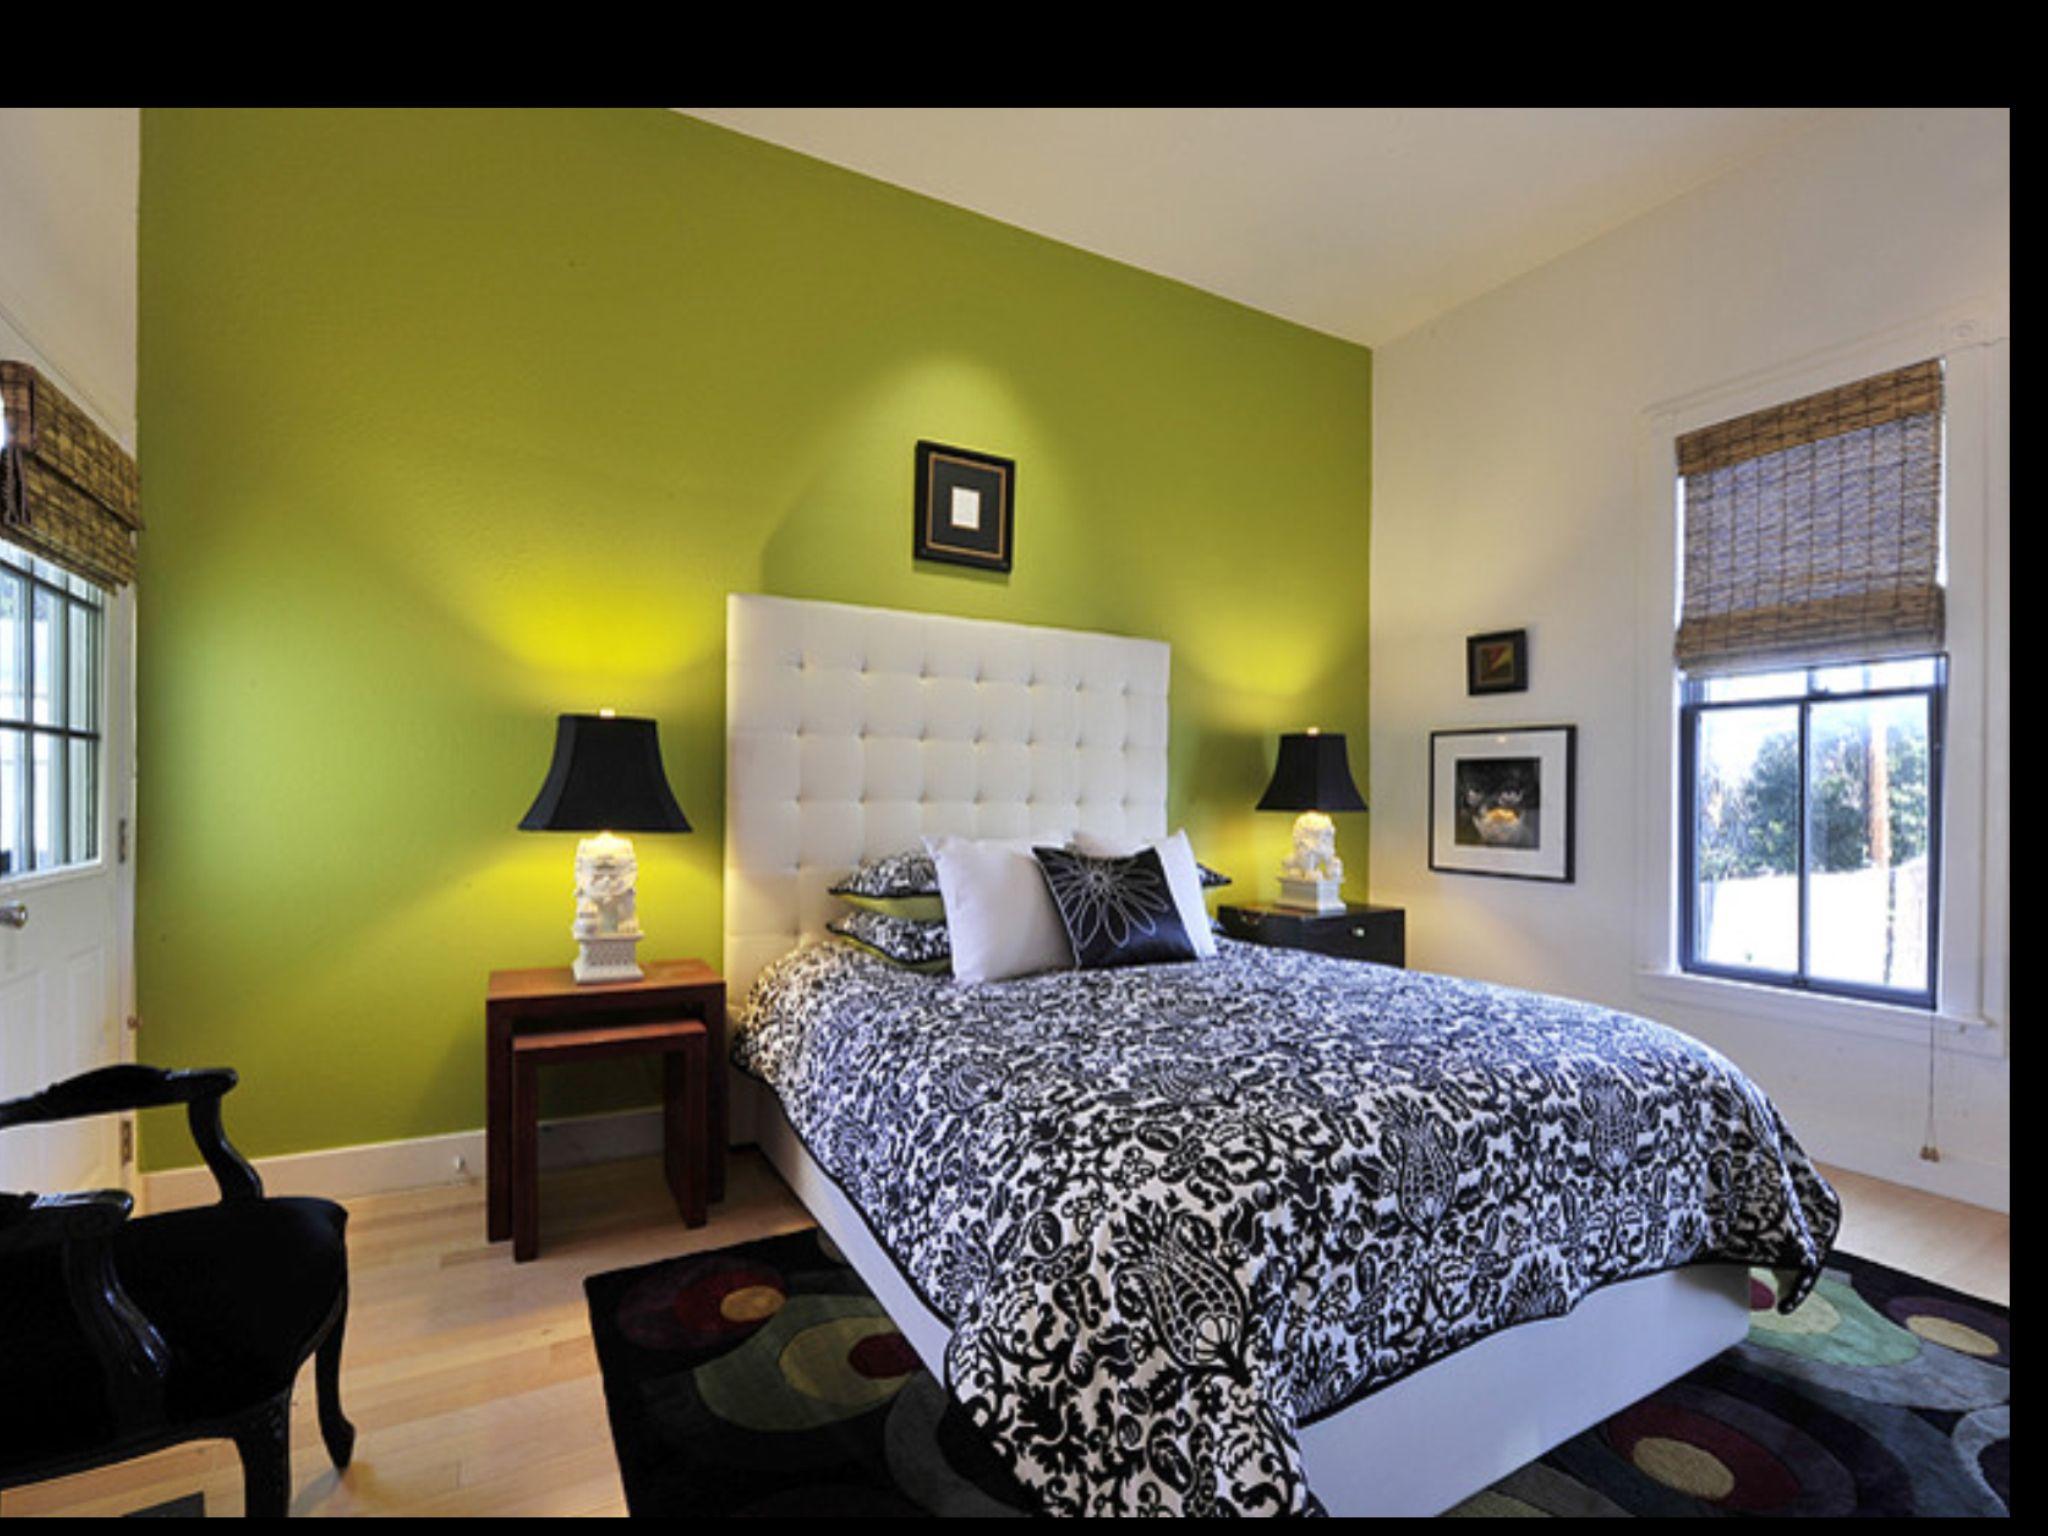 Pin by Peter Elana Primbetov on Bedrooms Lime green